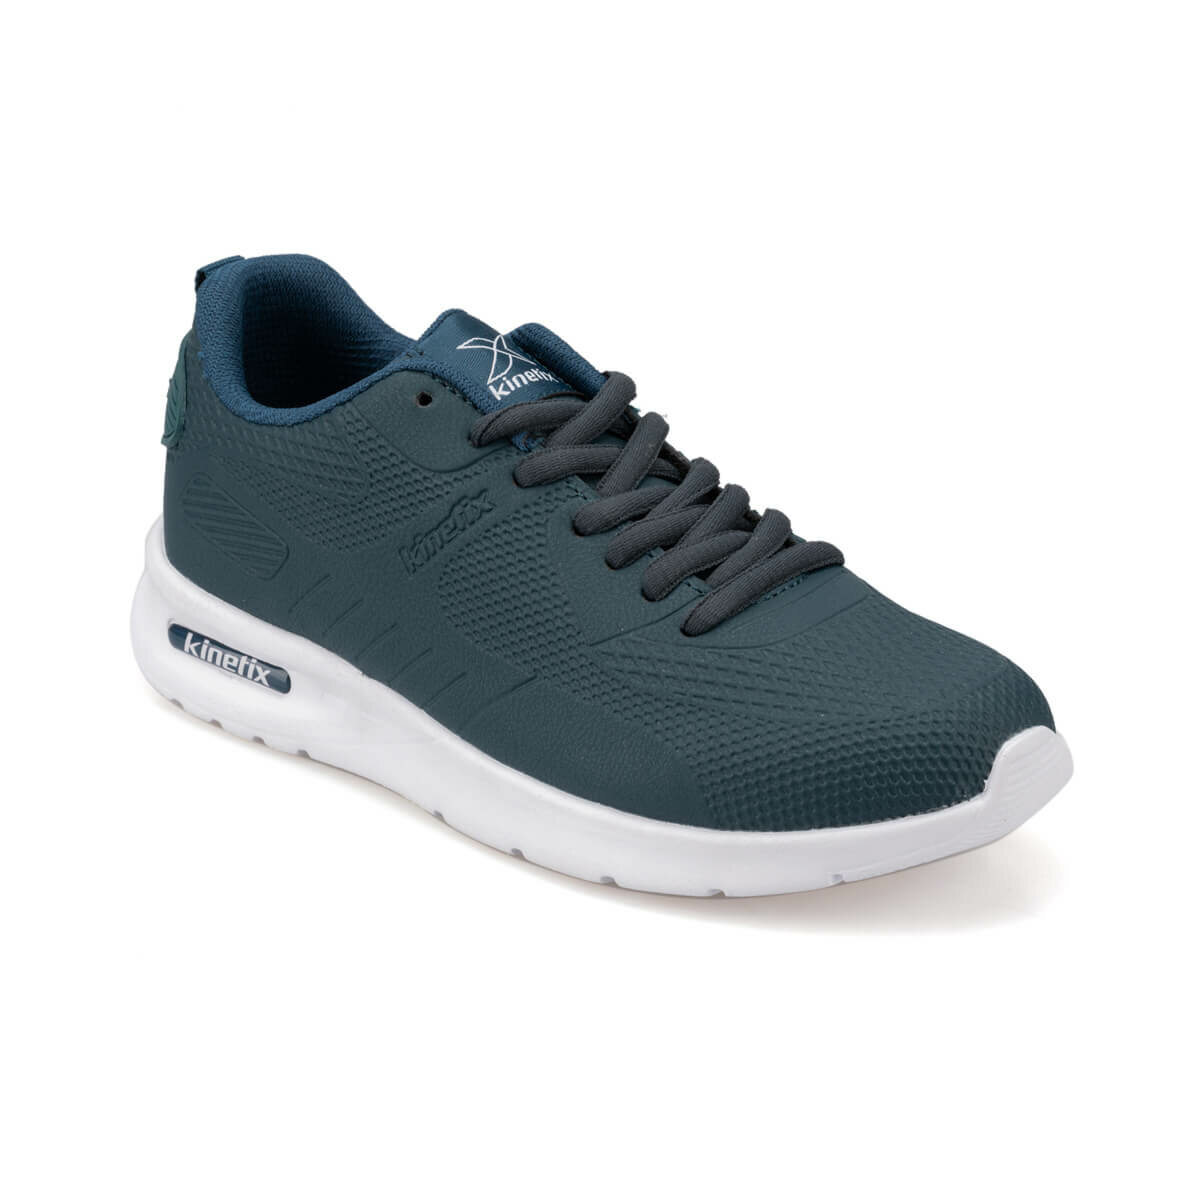 FLO NINA PU 9PR Oil Female Sneaker Shoes KINETIX